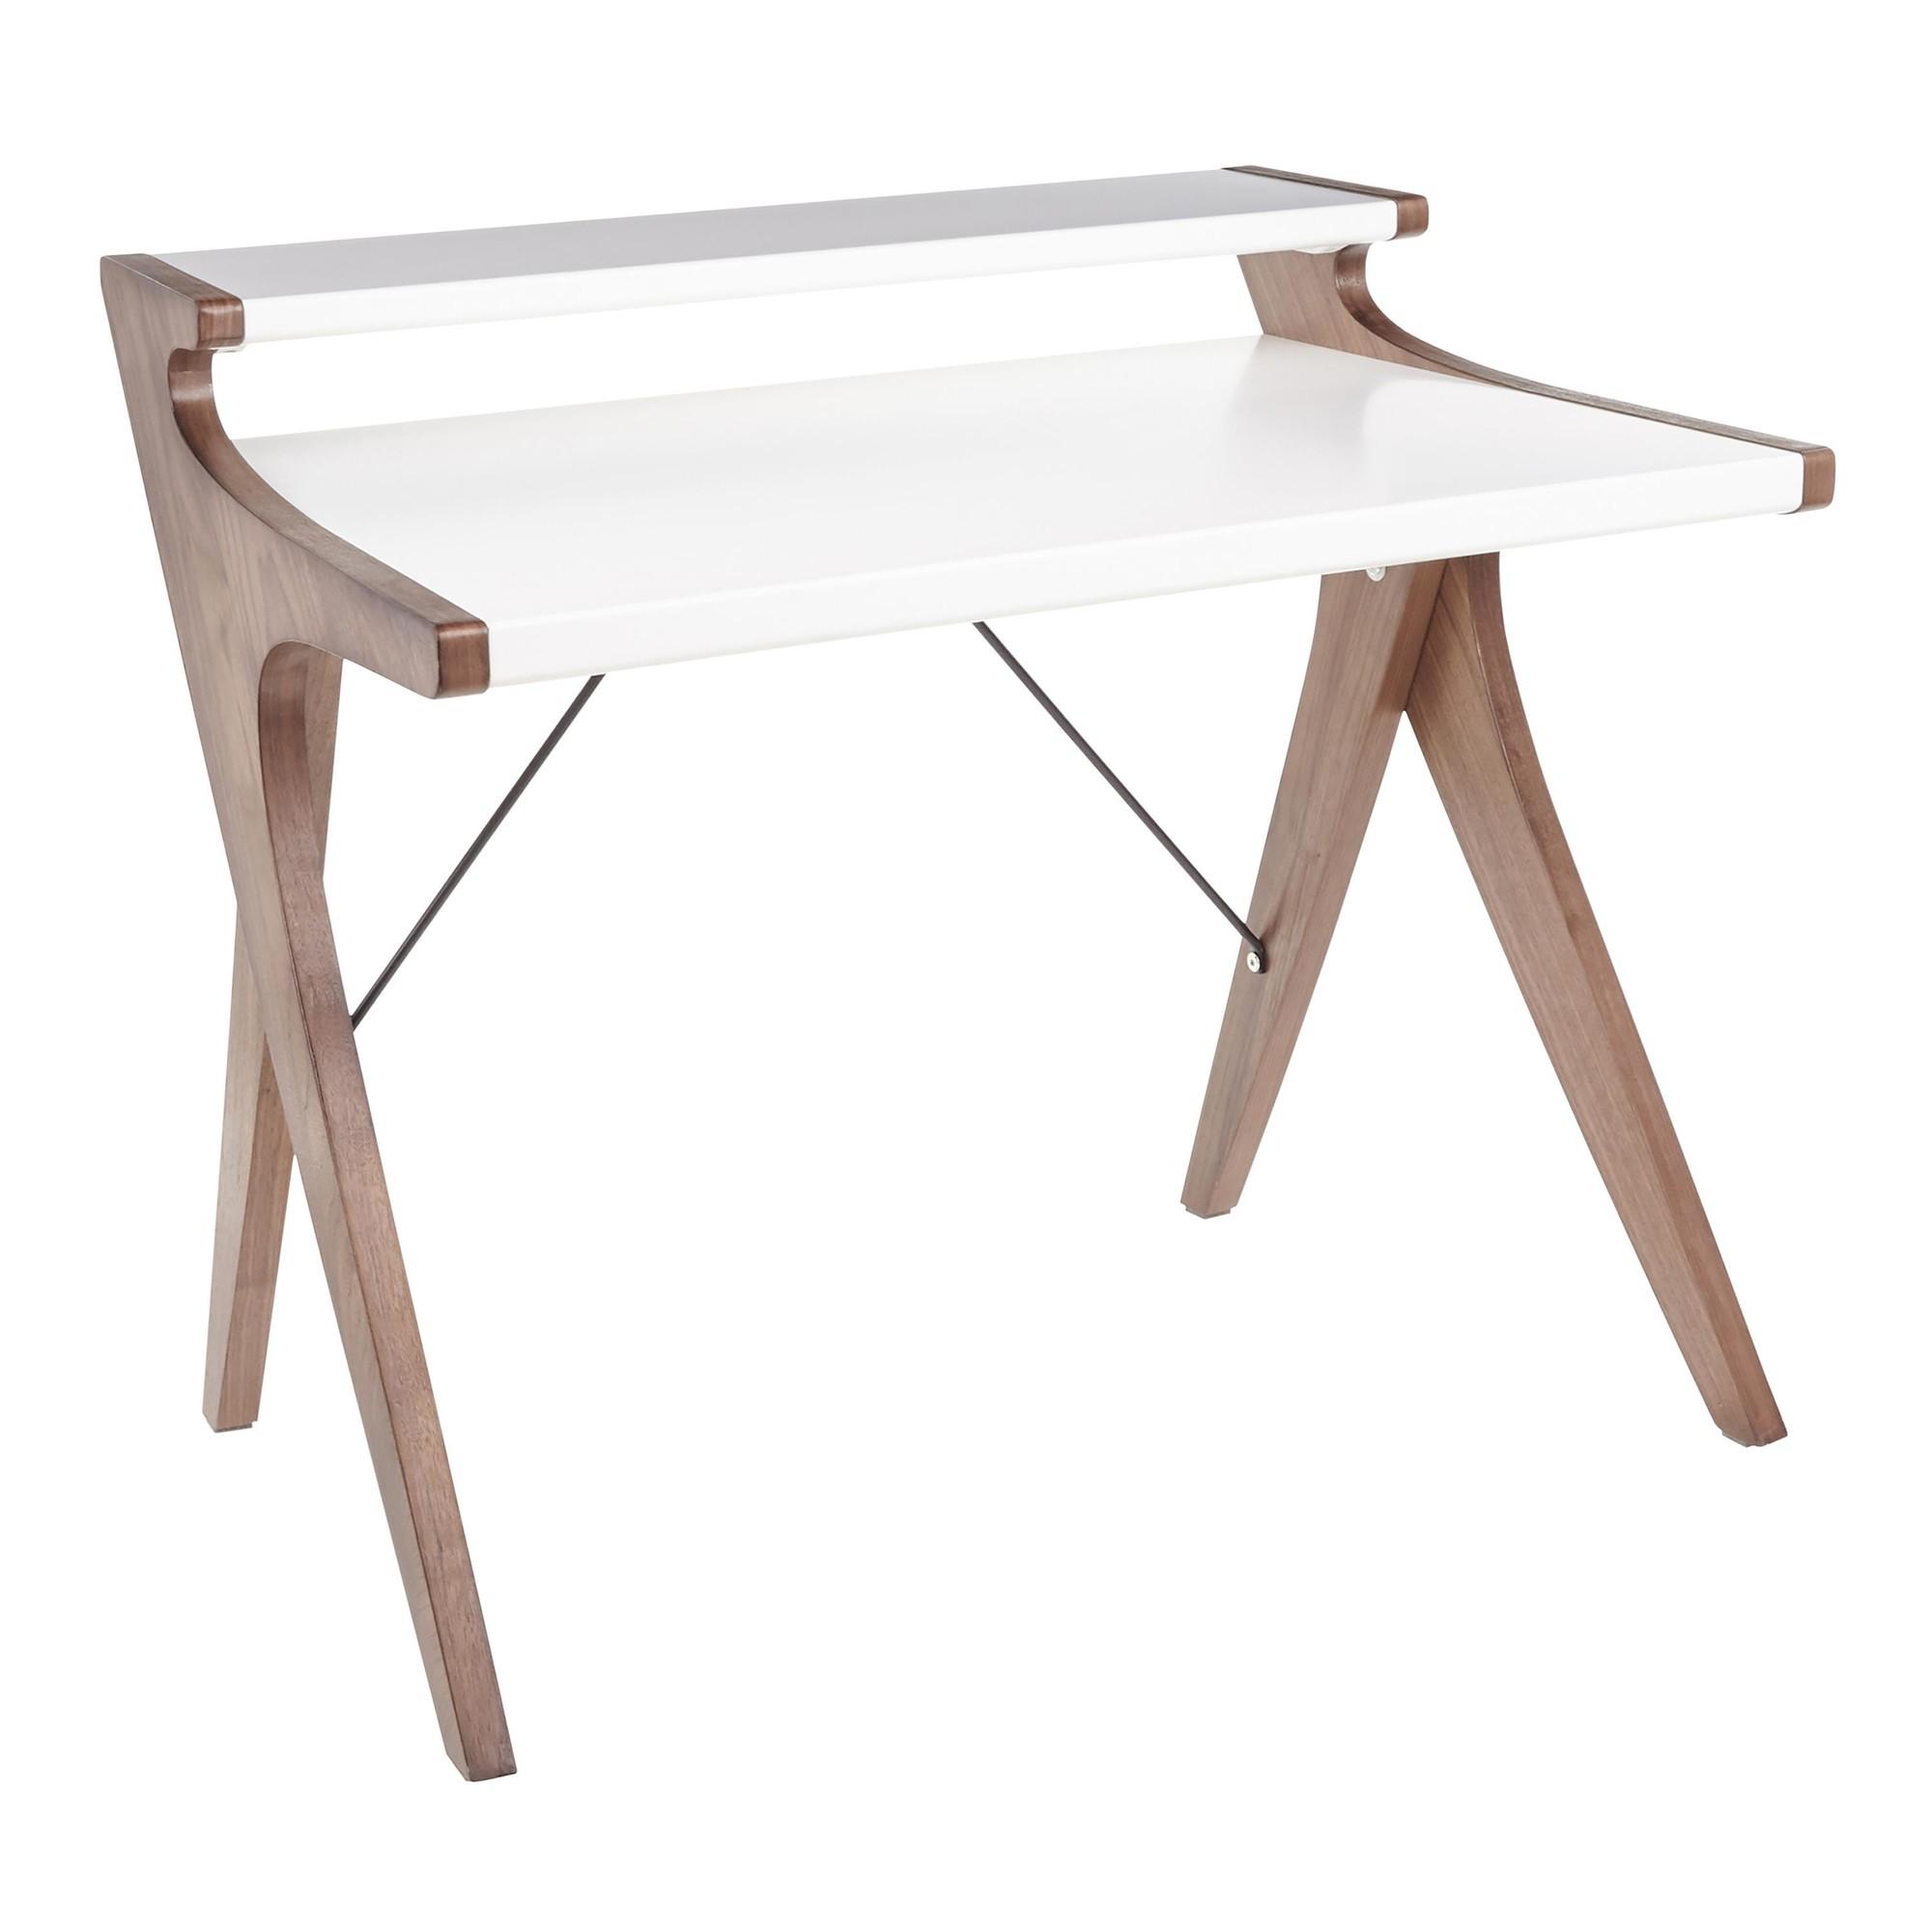 Archer Contemporary Desk in Walnut Wood w/ White Wood Top - Lumisource OFD-ARCHER WLW